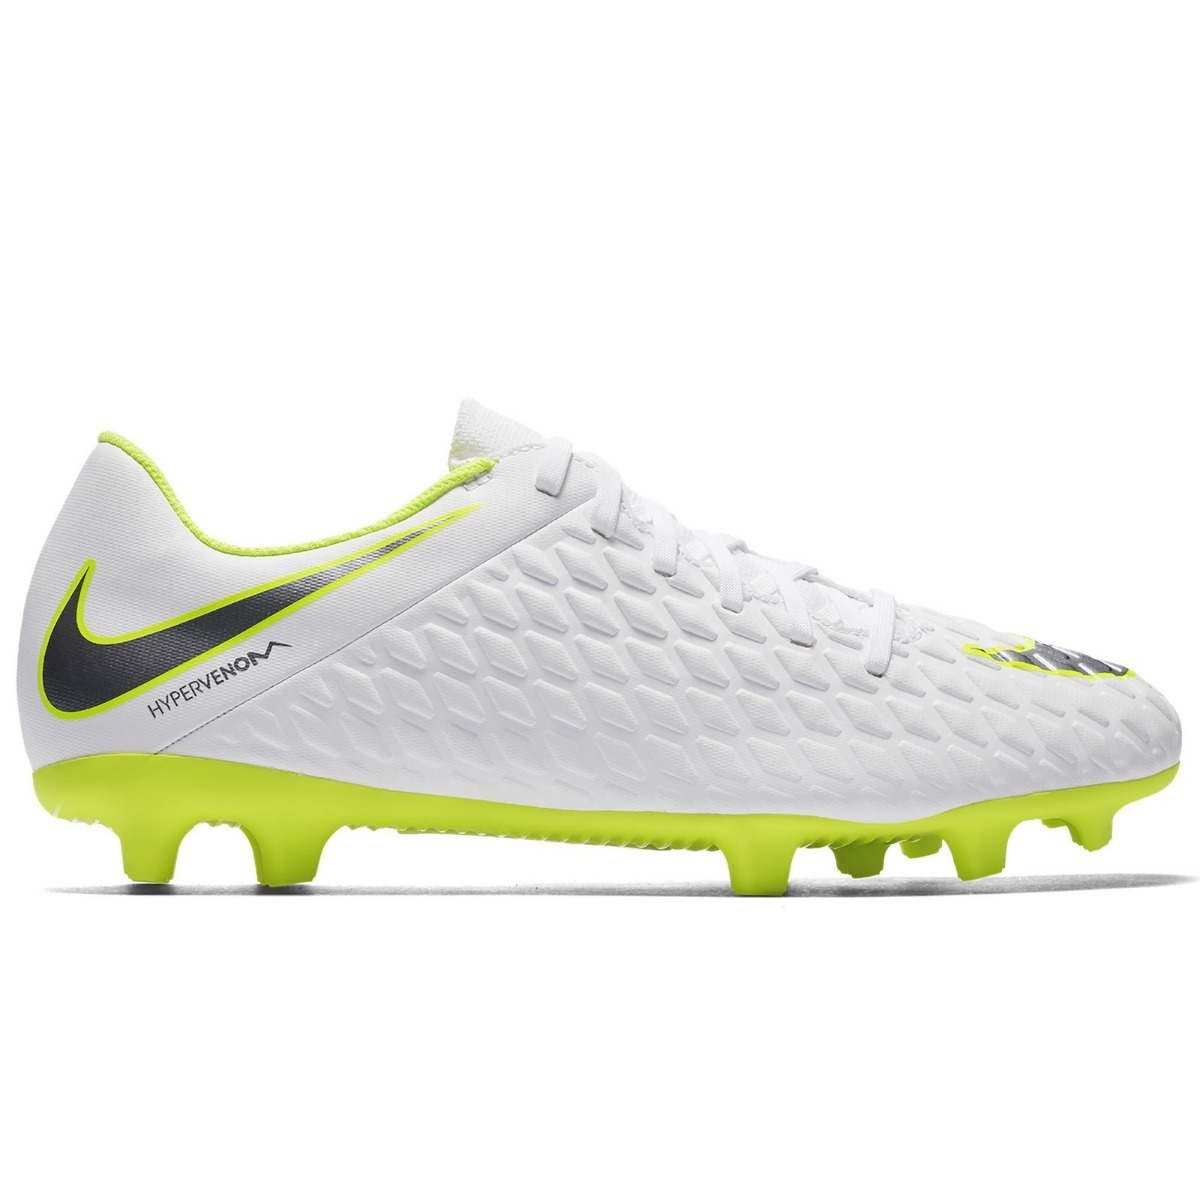 zapatos fútbol nike phantom 3 club fg   rincón del fútbol. Cargando zoom. bbd2248407f22